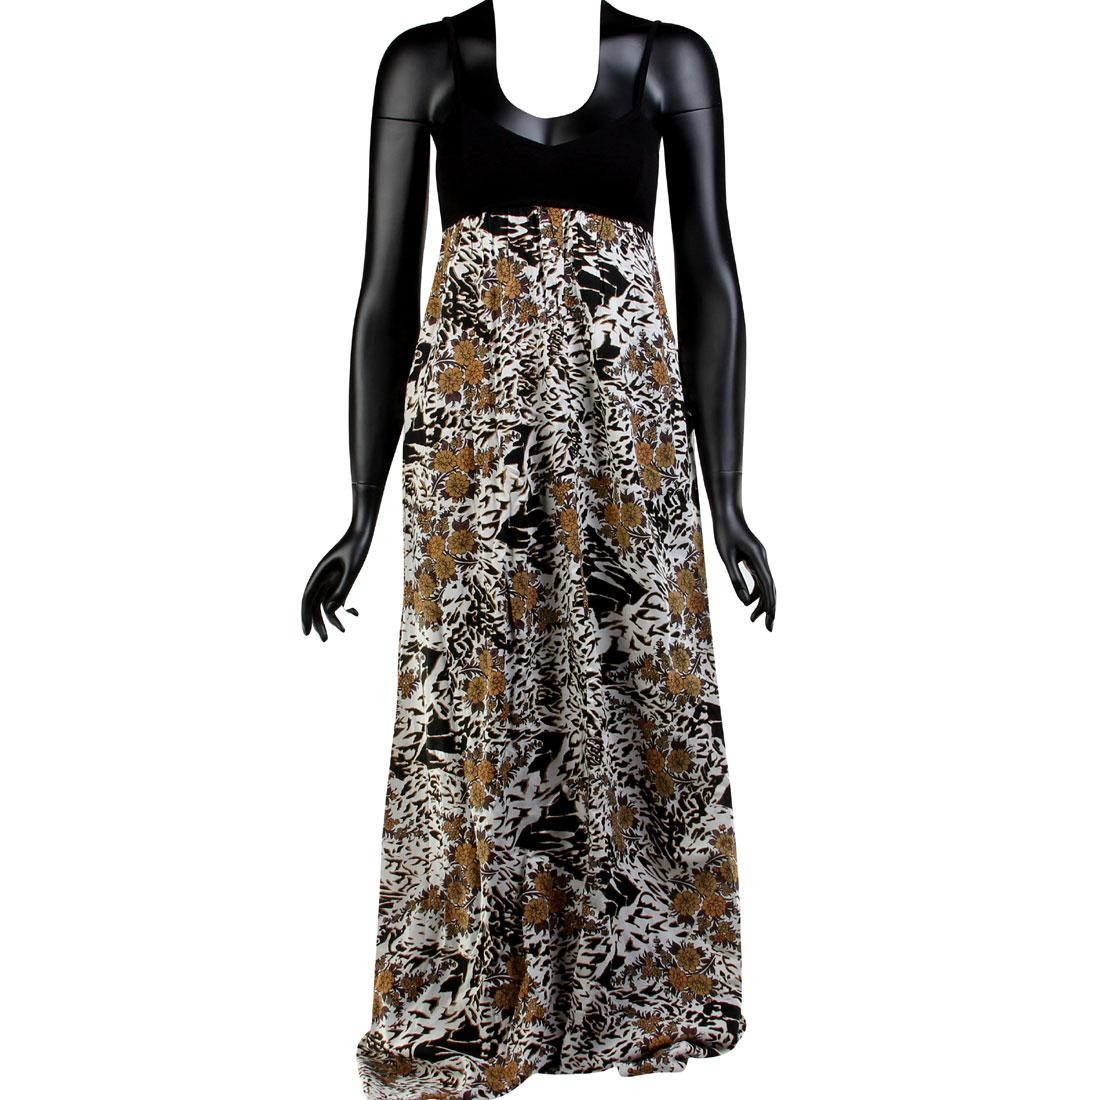 RVCA カーボン ドレス レディースファッション ワンピース レディース 【 Women Carbon Ribs Dress (black / Cloud) 】 Black / Cloud